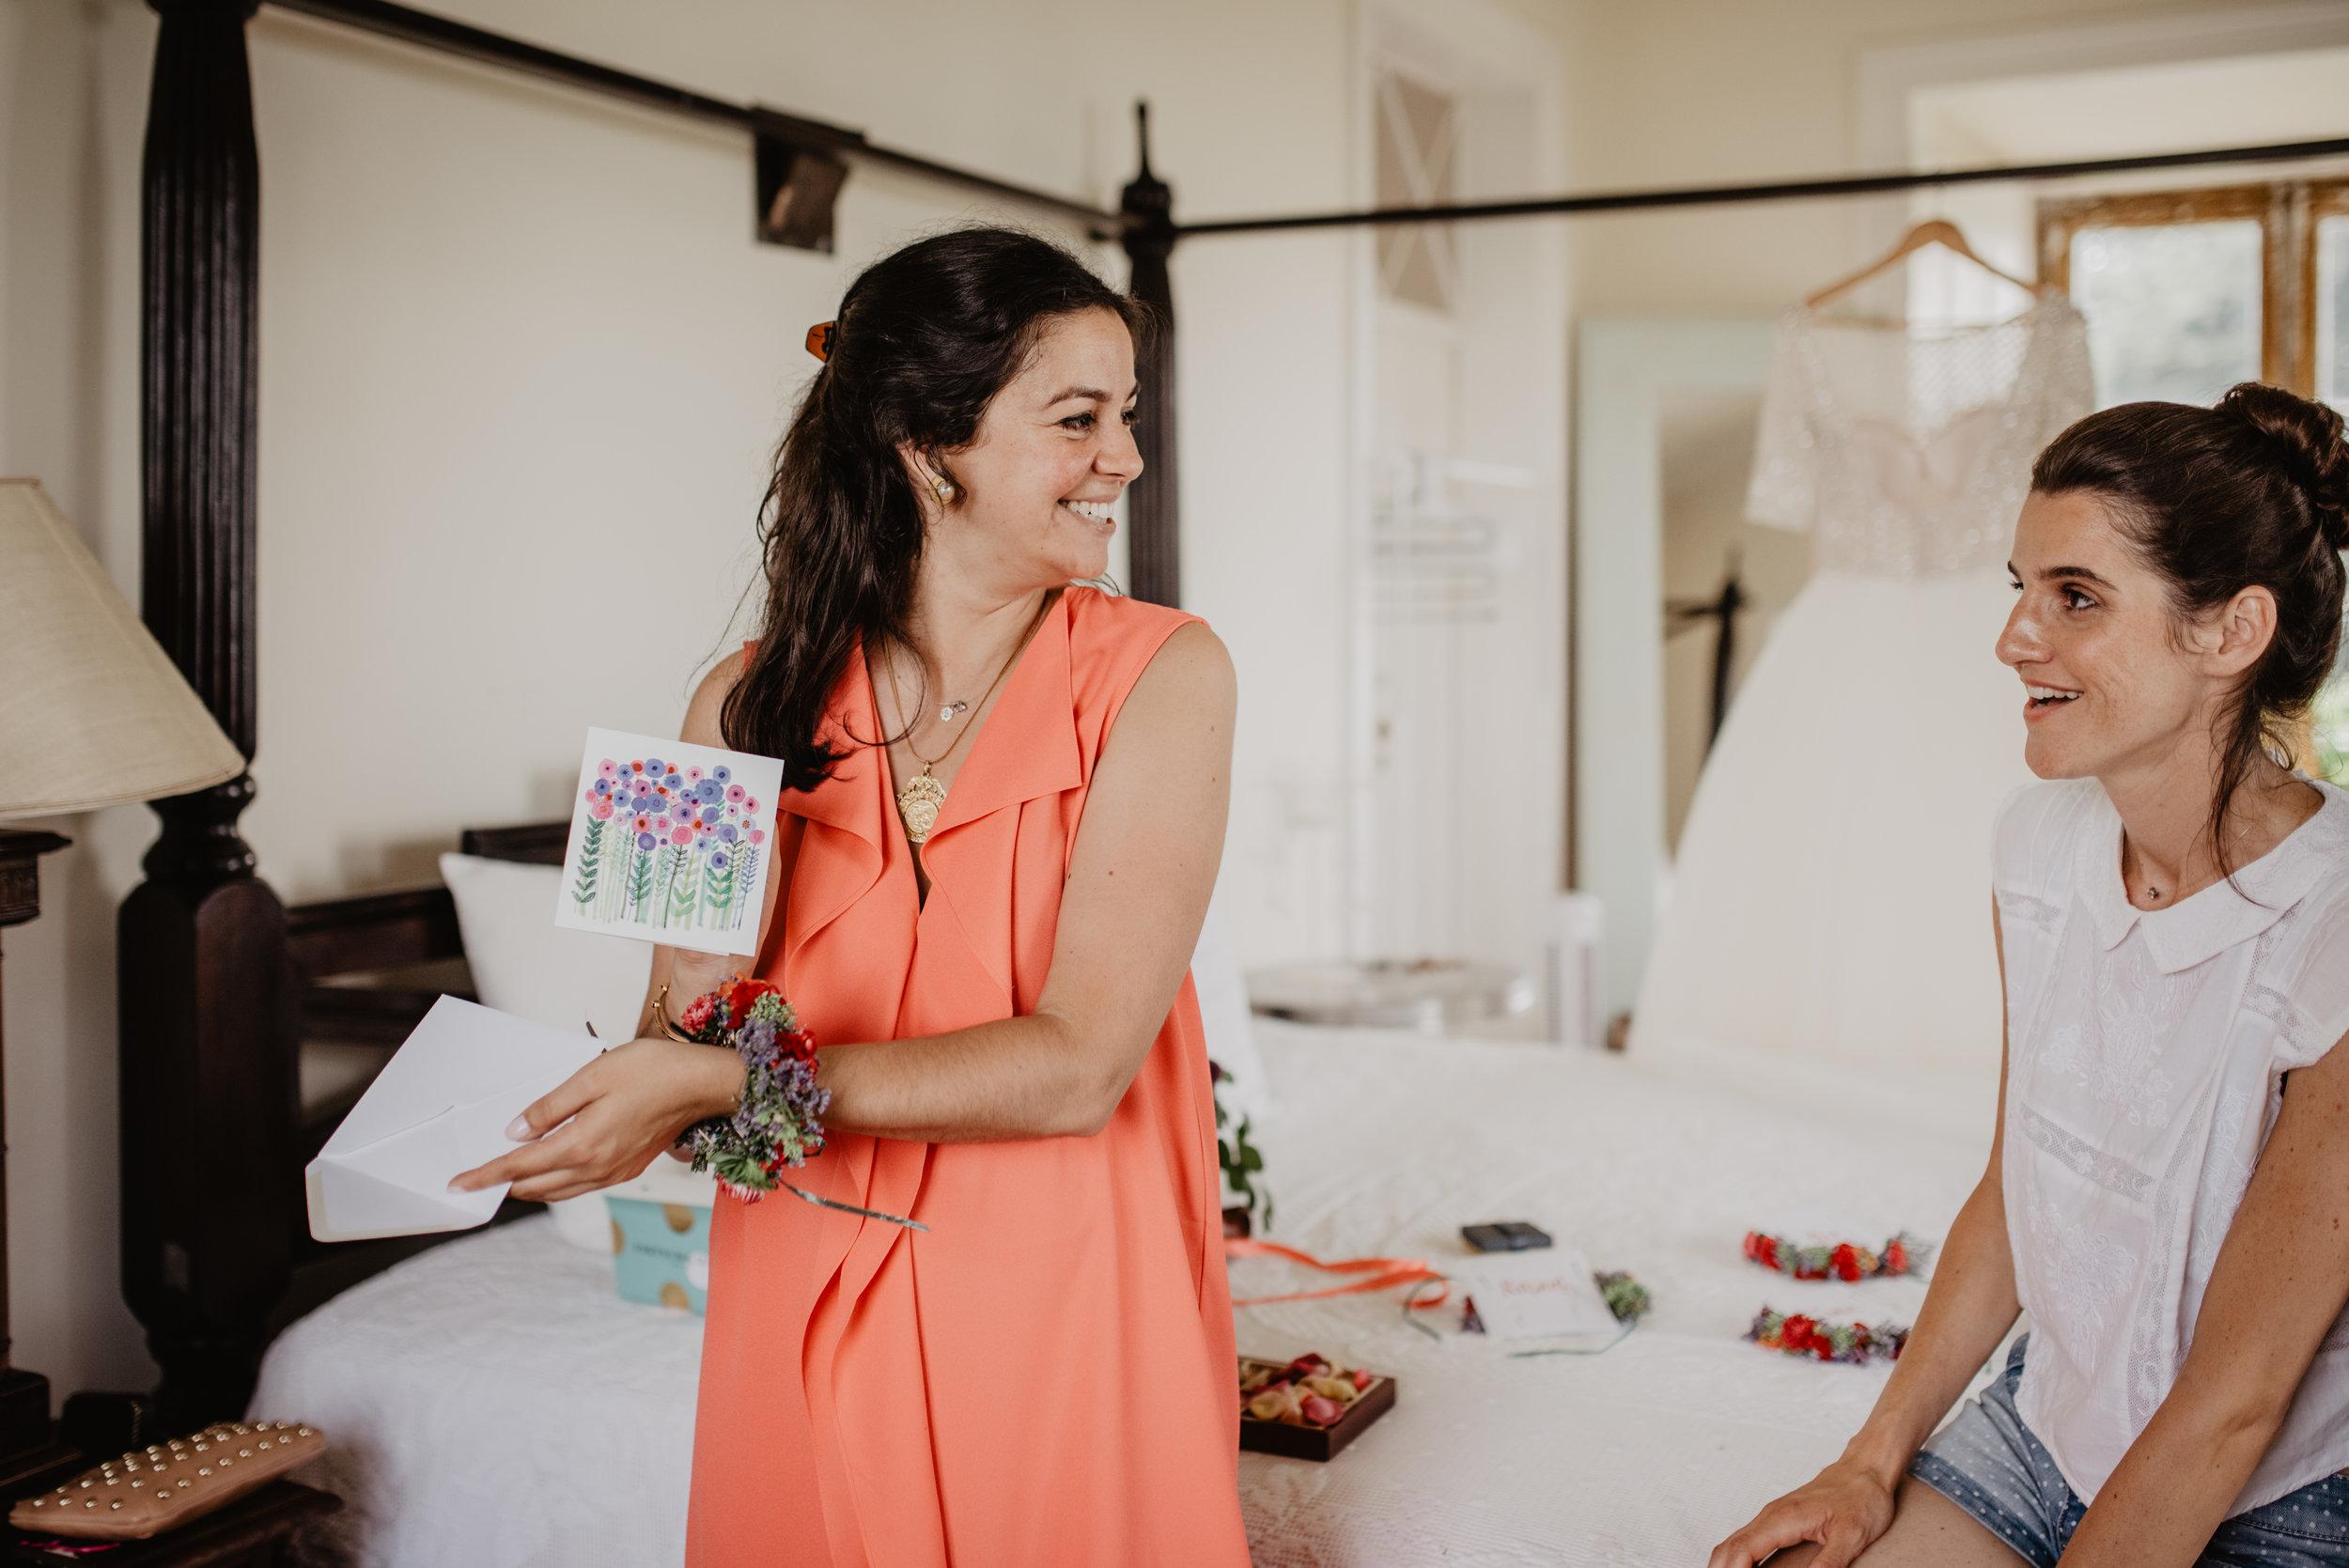 Lapela-photography-wedding-sintra-portugal-38.jpg